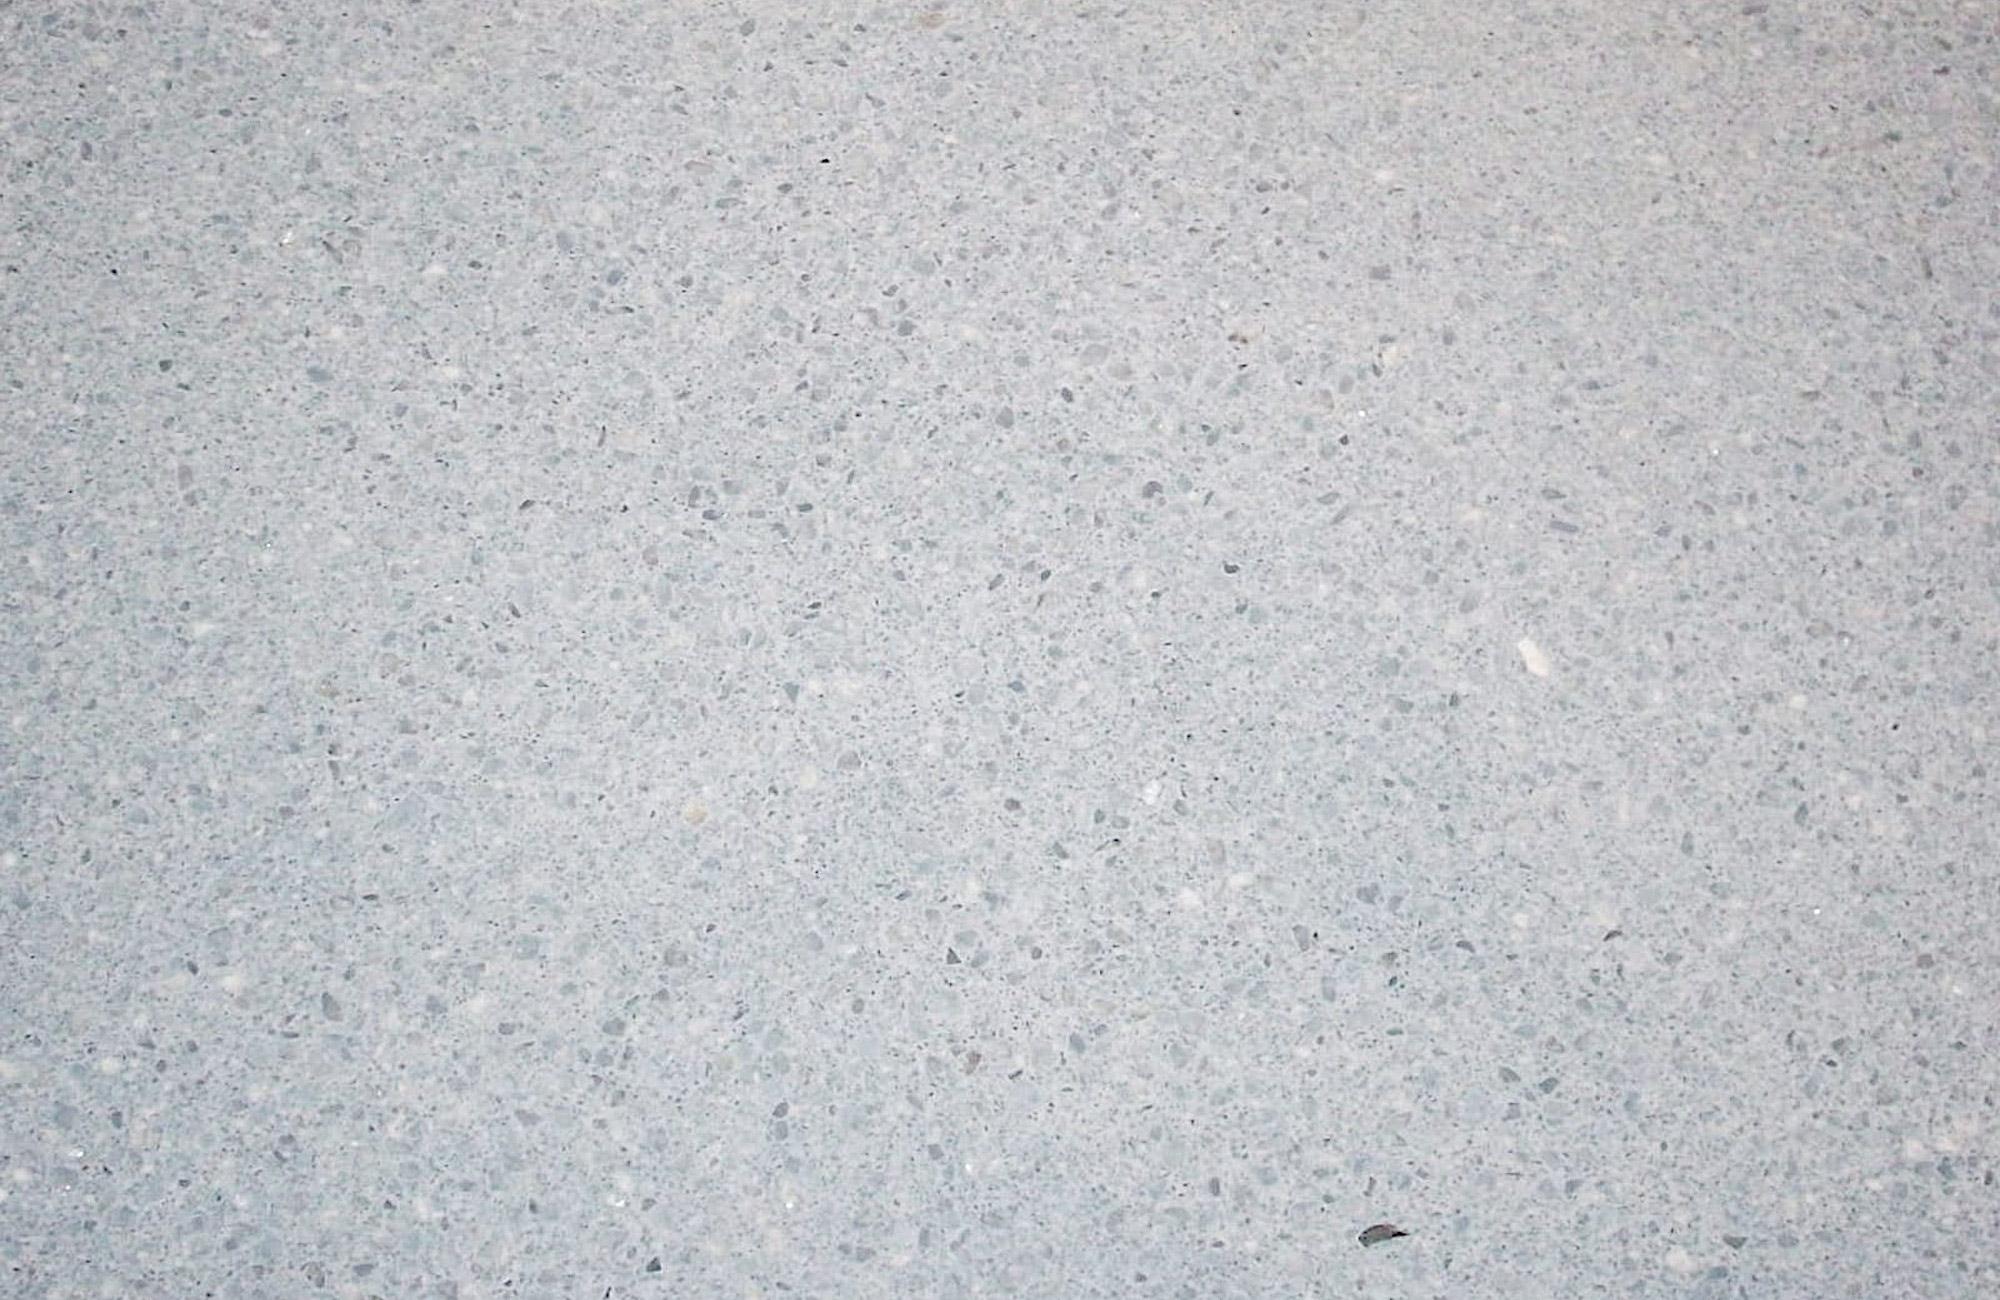 Concrete Flooring Texture. high resolution seamless